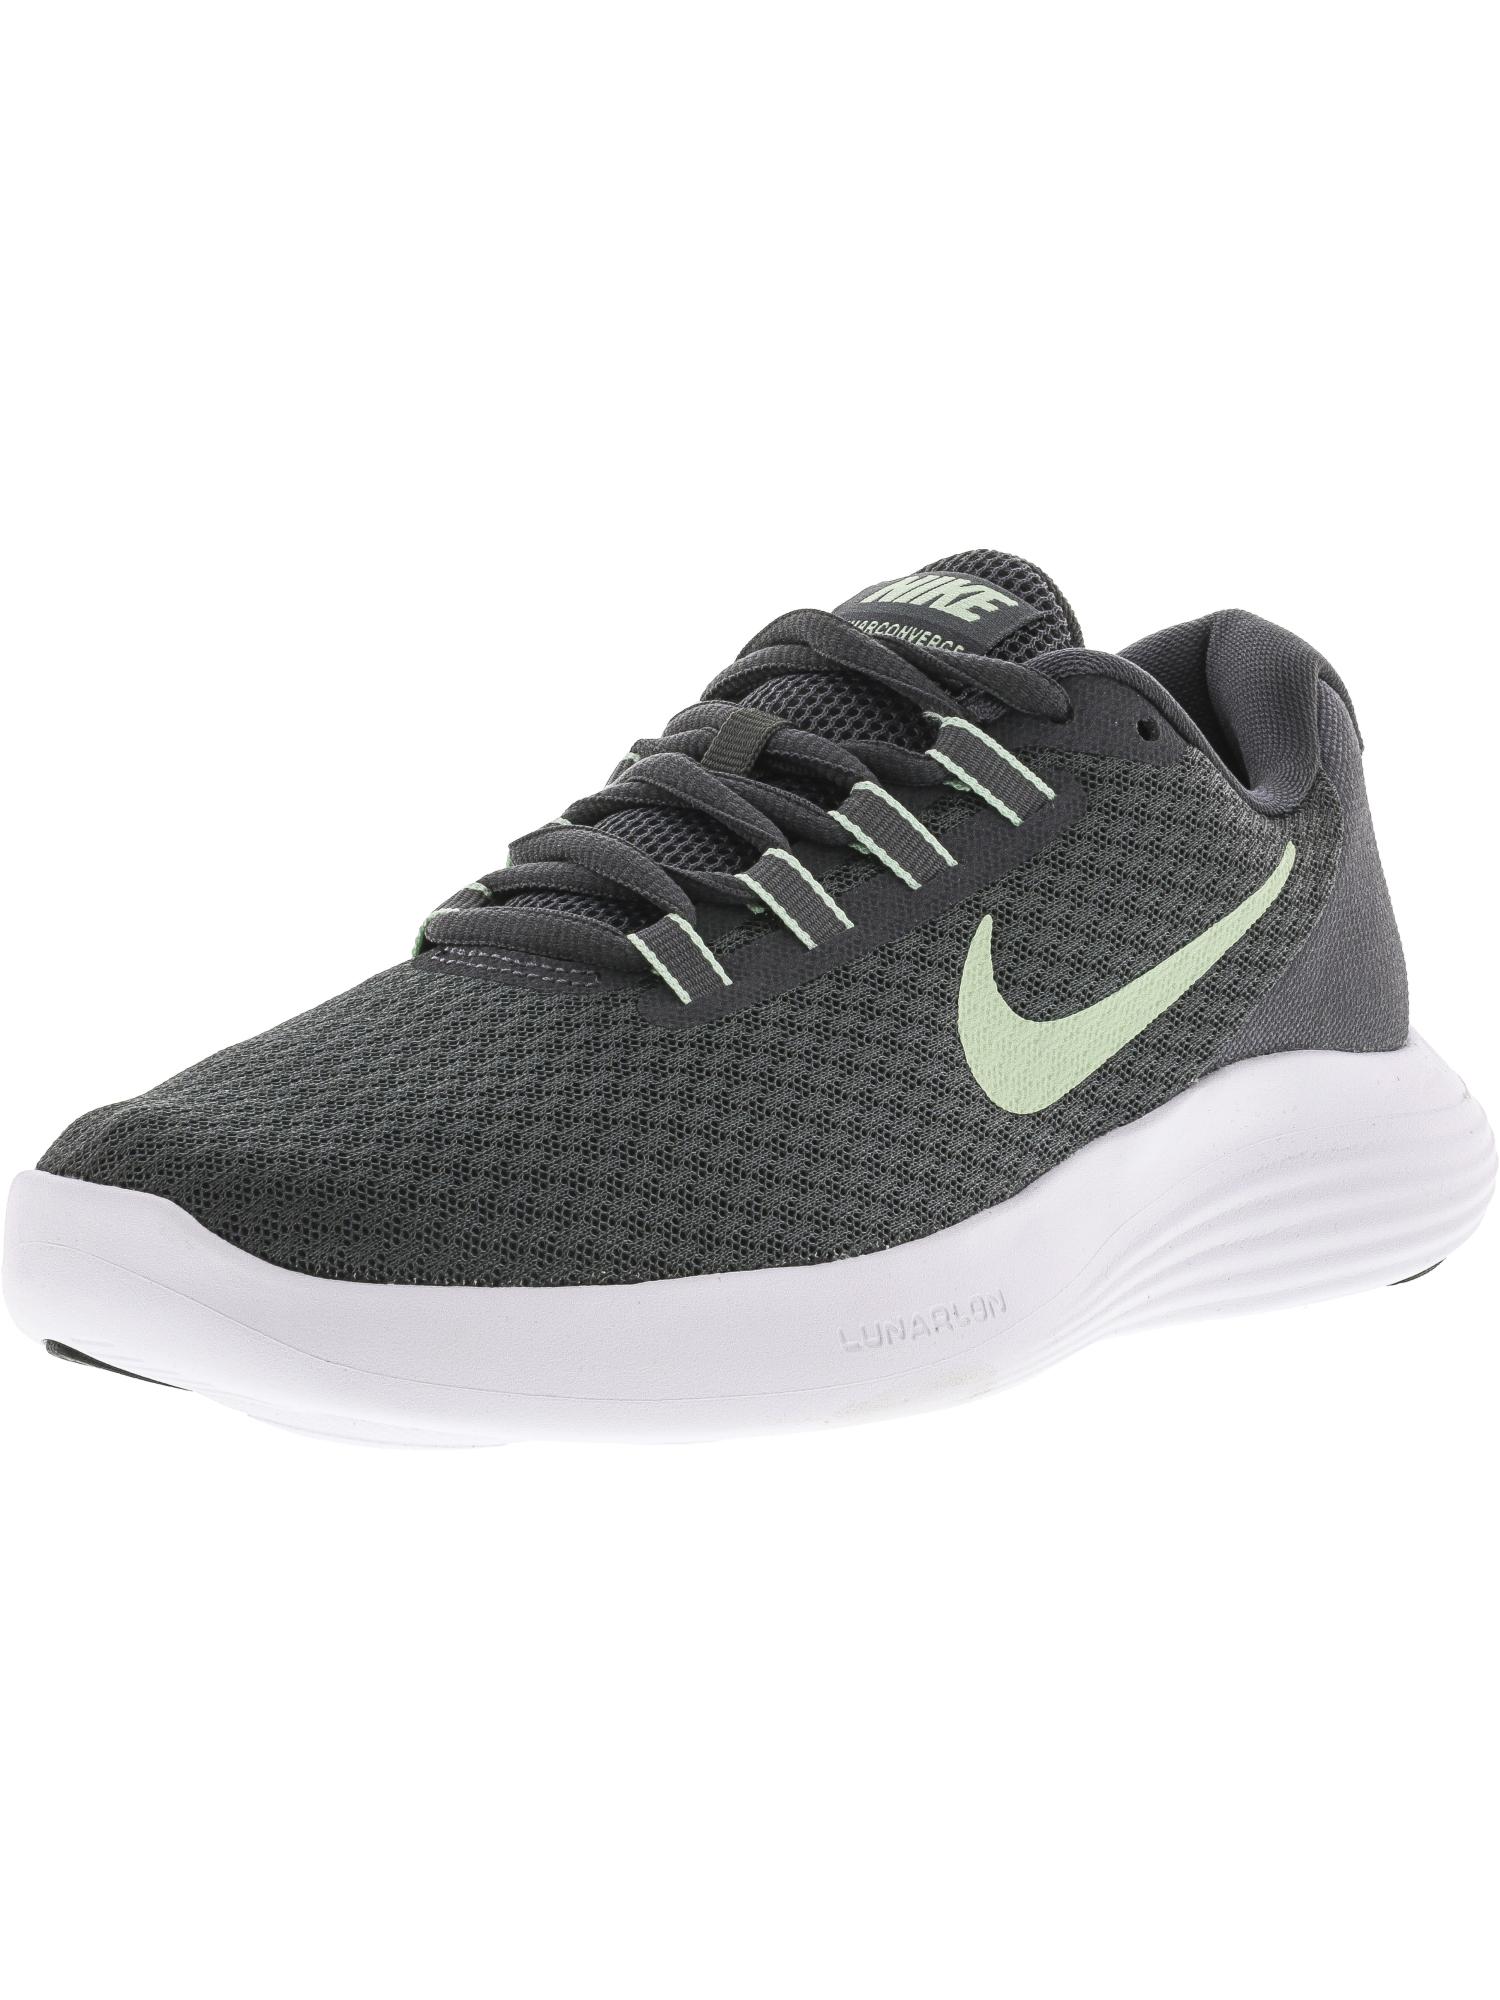 more photos fdefb e7a72 ... Nike Men s Lunarconverge Ankle-High Running Shoe Shoe Shoe 1db12e ...